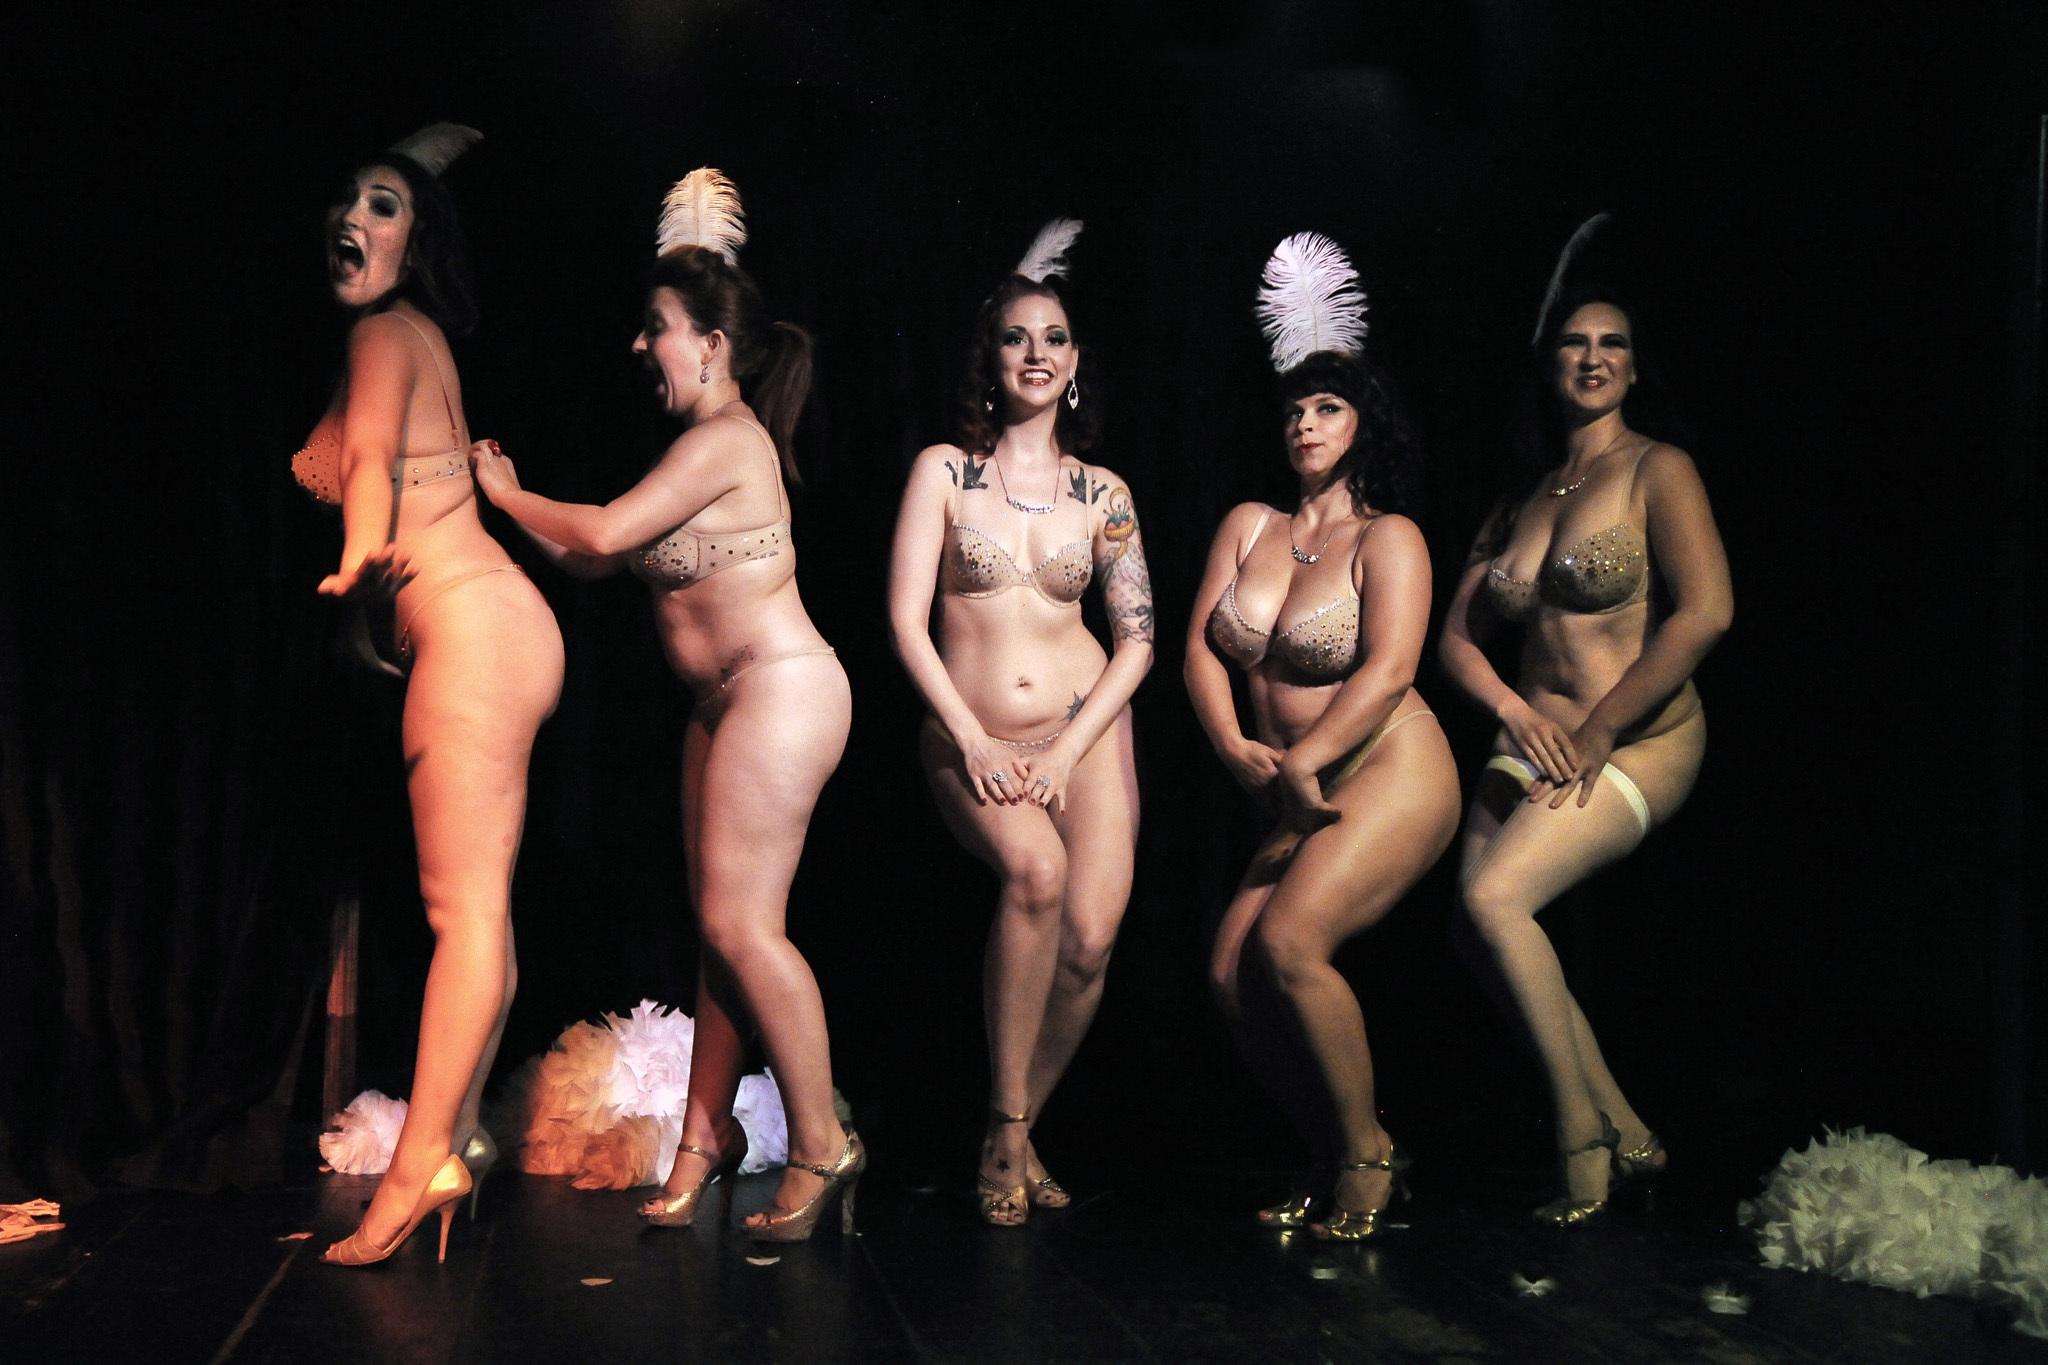 Razzmatazz Revue at Casa Mezcal slide show